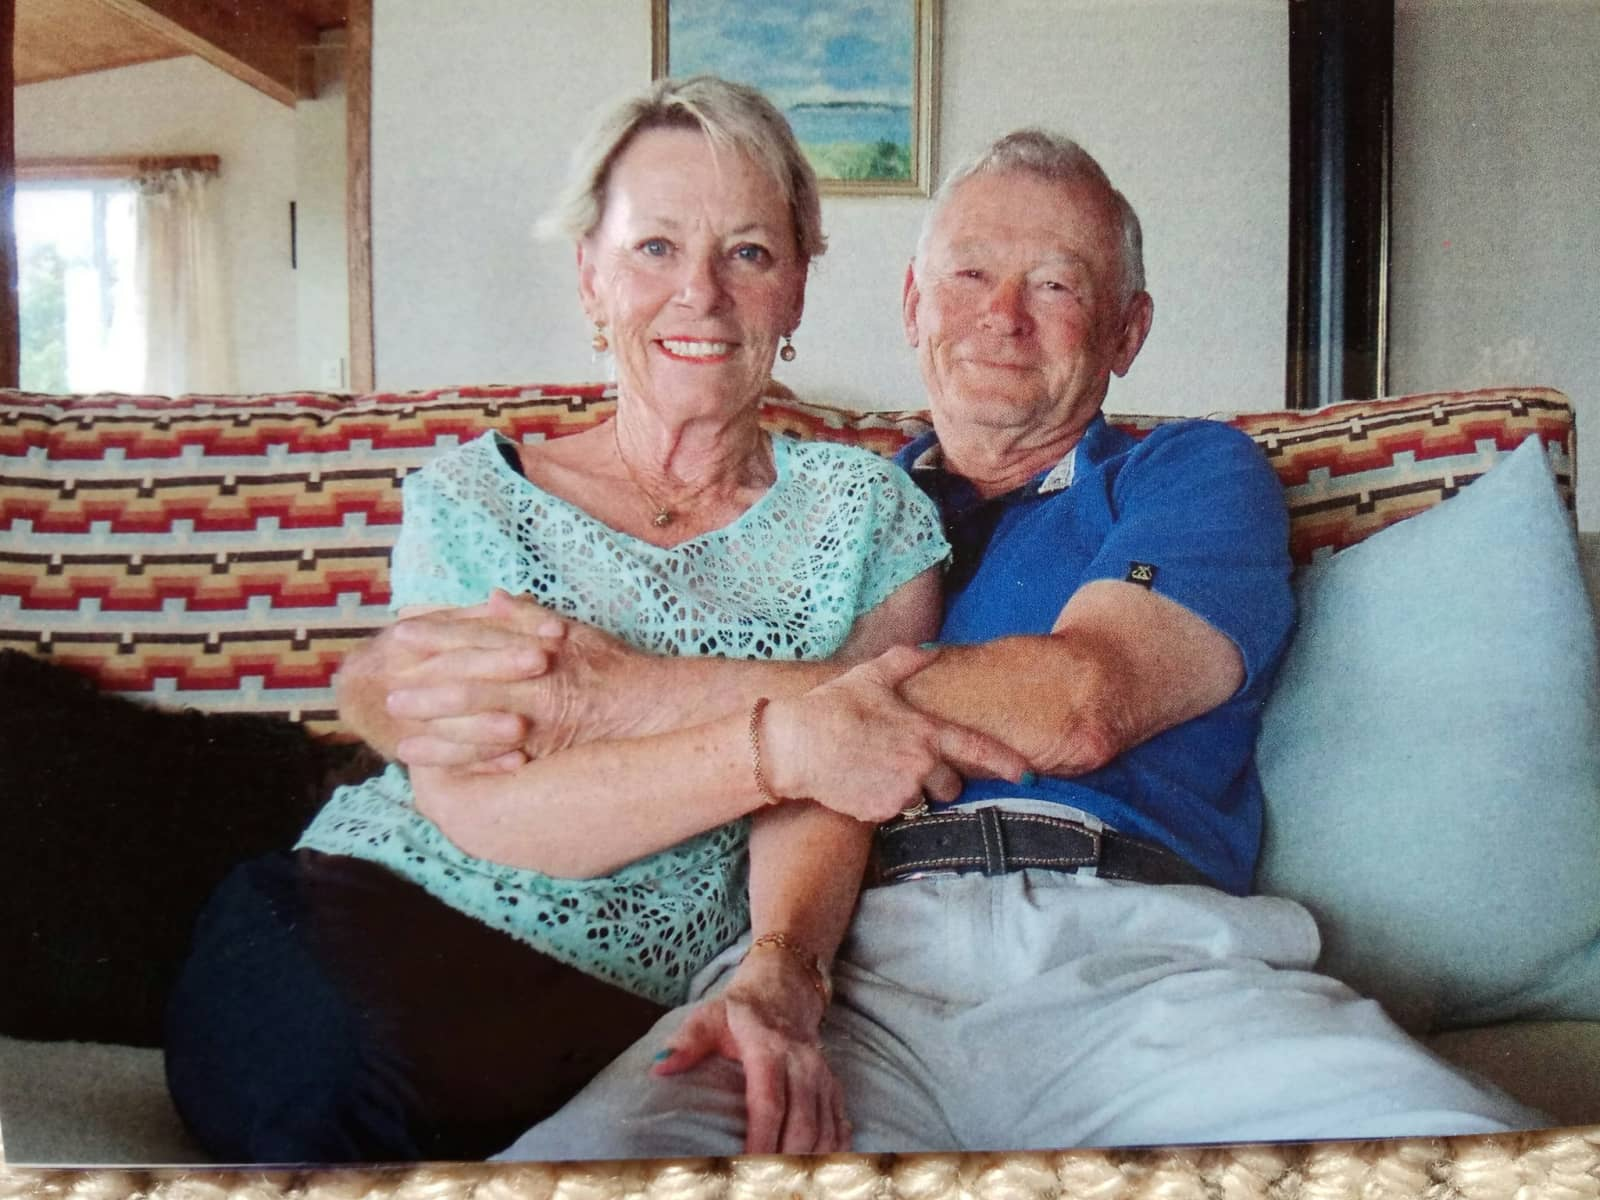 John & Sue from Whangarei, New Zealand